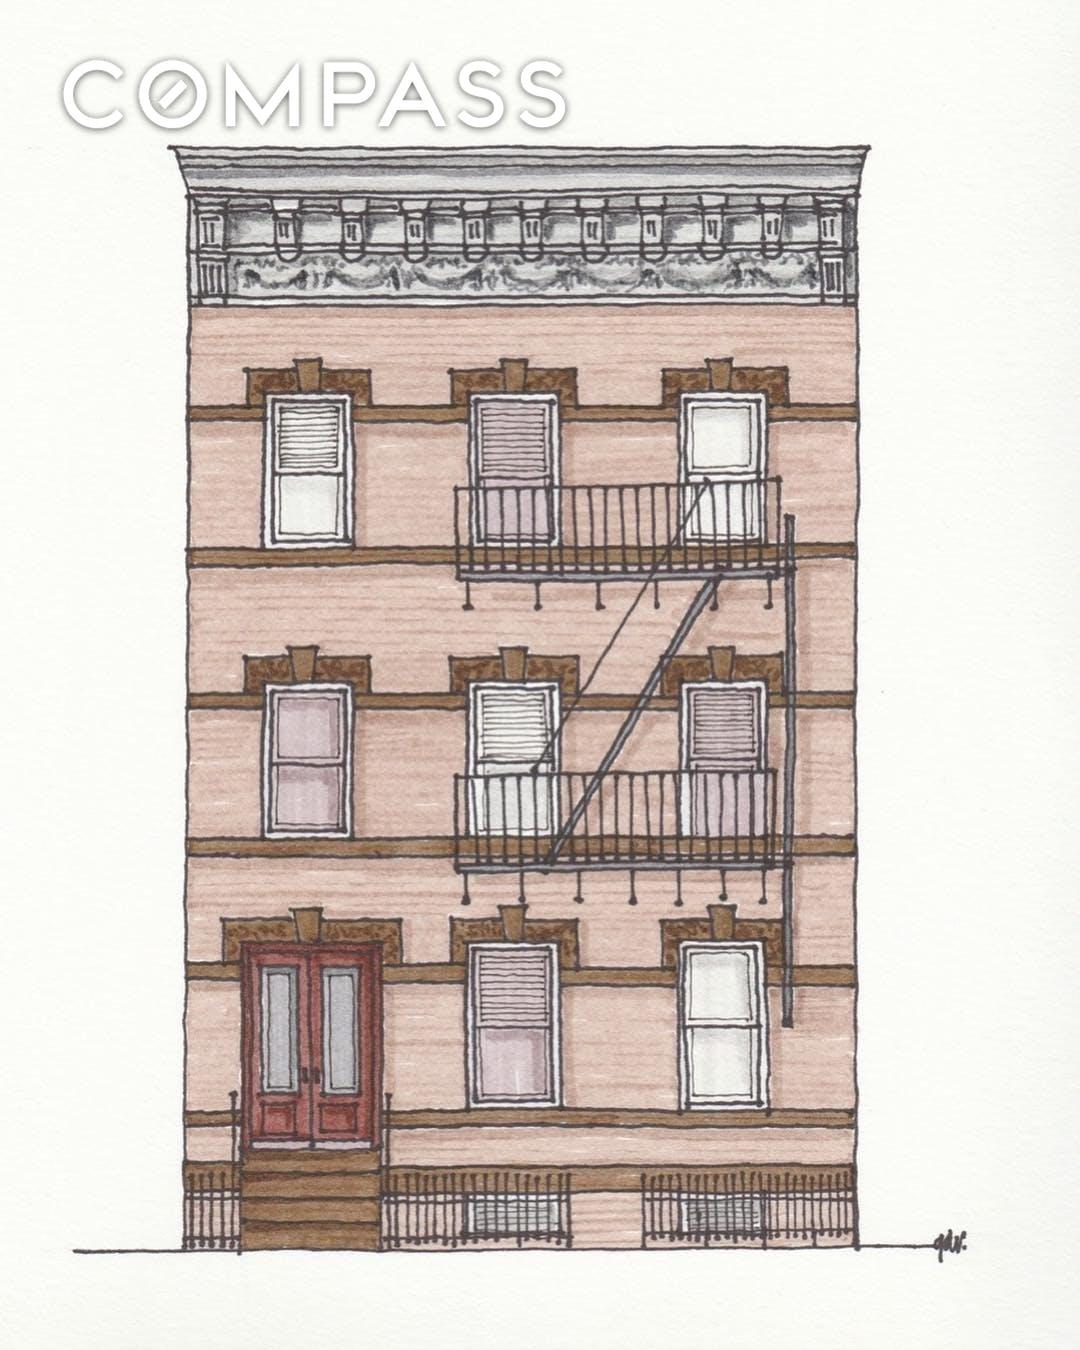 392 Linden Street Brooklyn, NY 11237